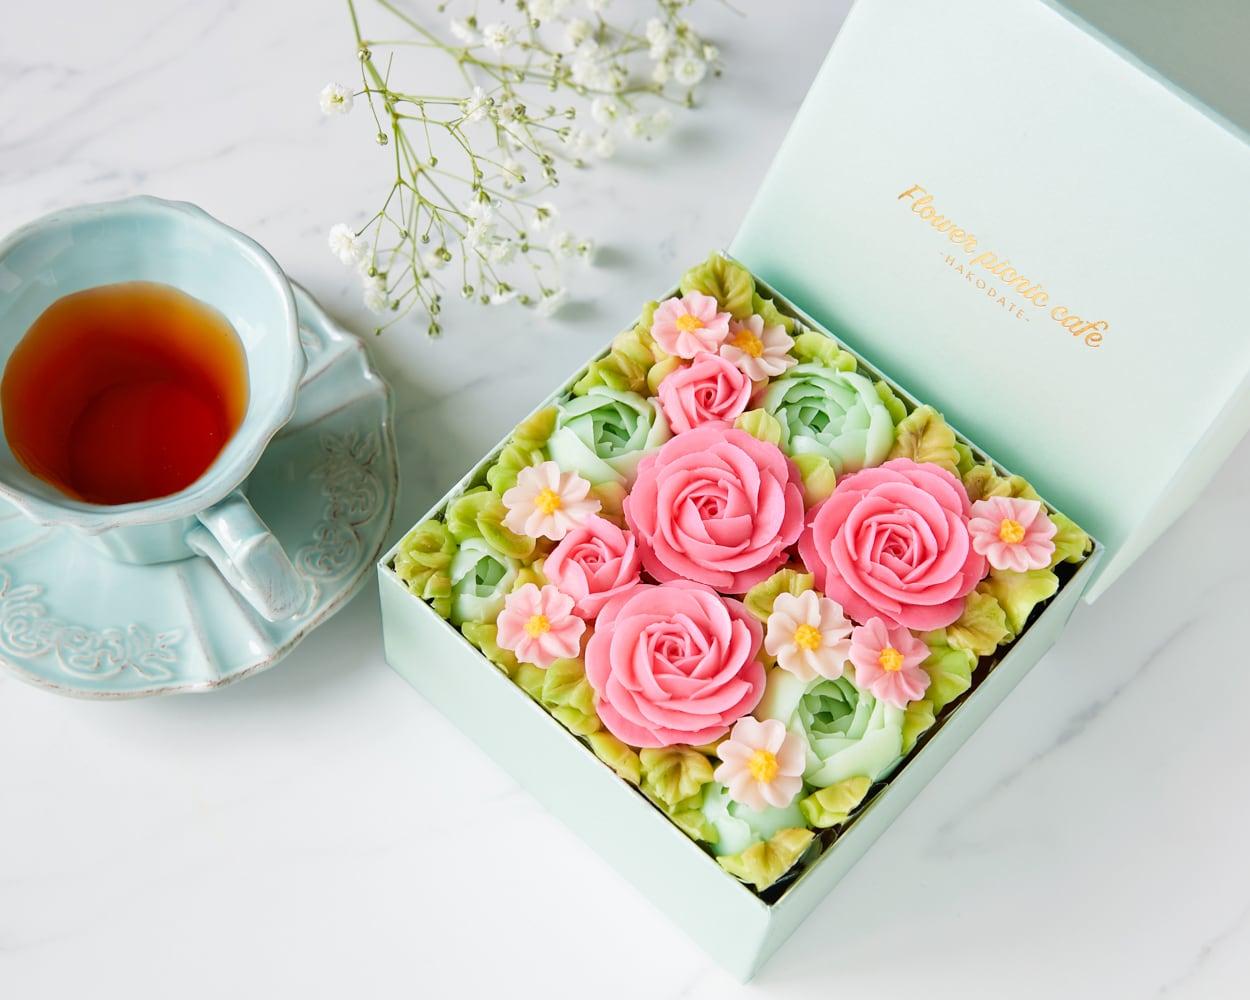 【Spring Garden】食べられるお花のボックスフラワーケーキ